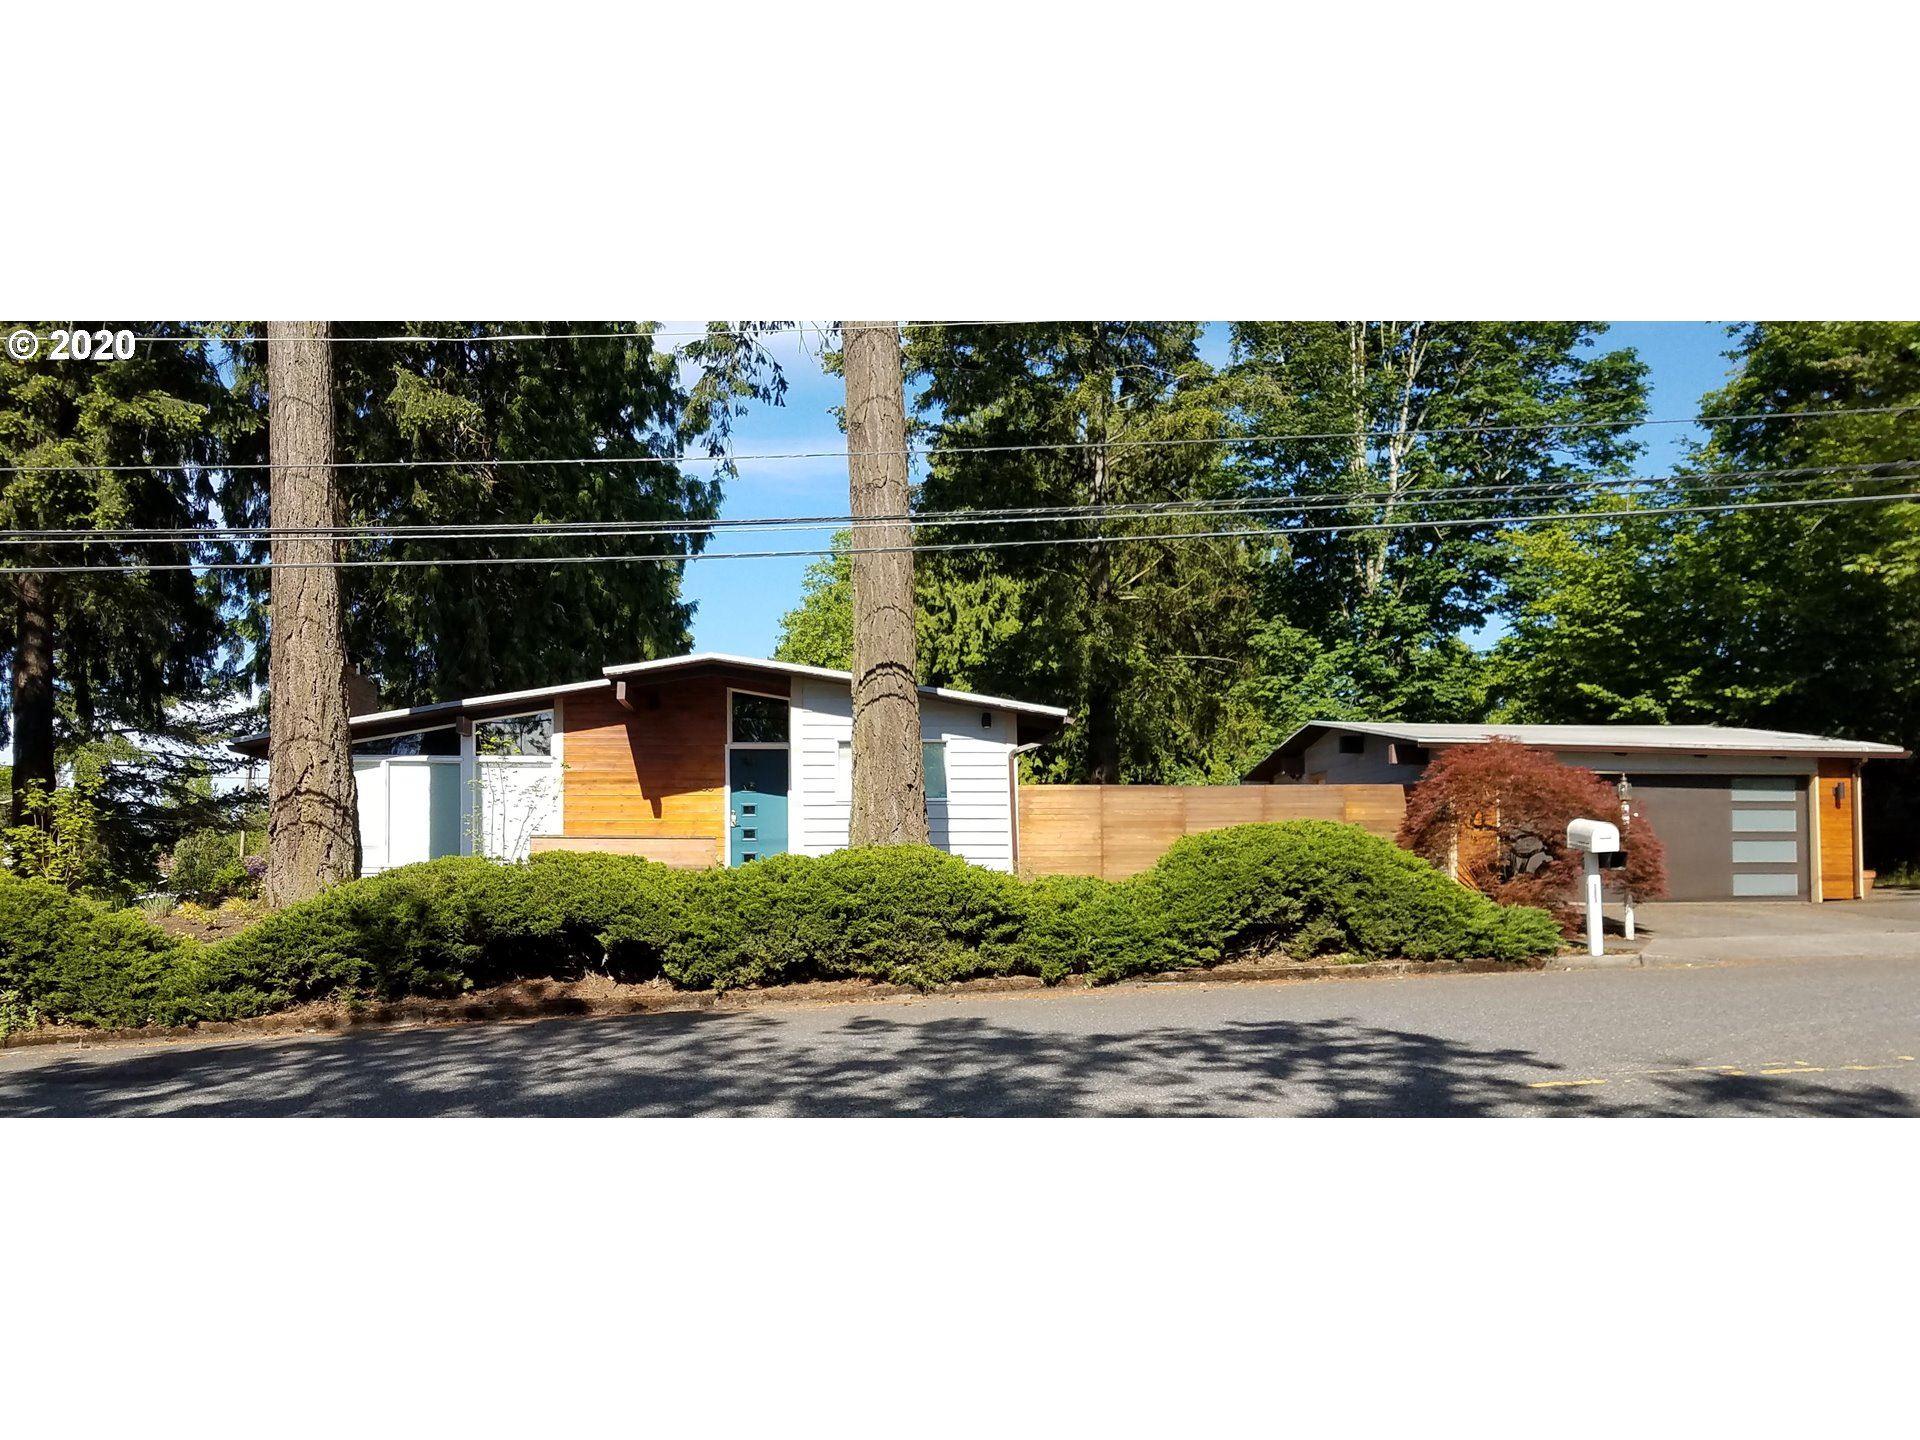 4735 SW JAMIESON RD, Beaverton, OR 97005 - MLS#: 20489106